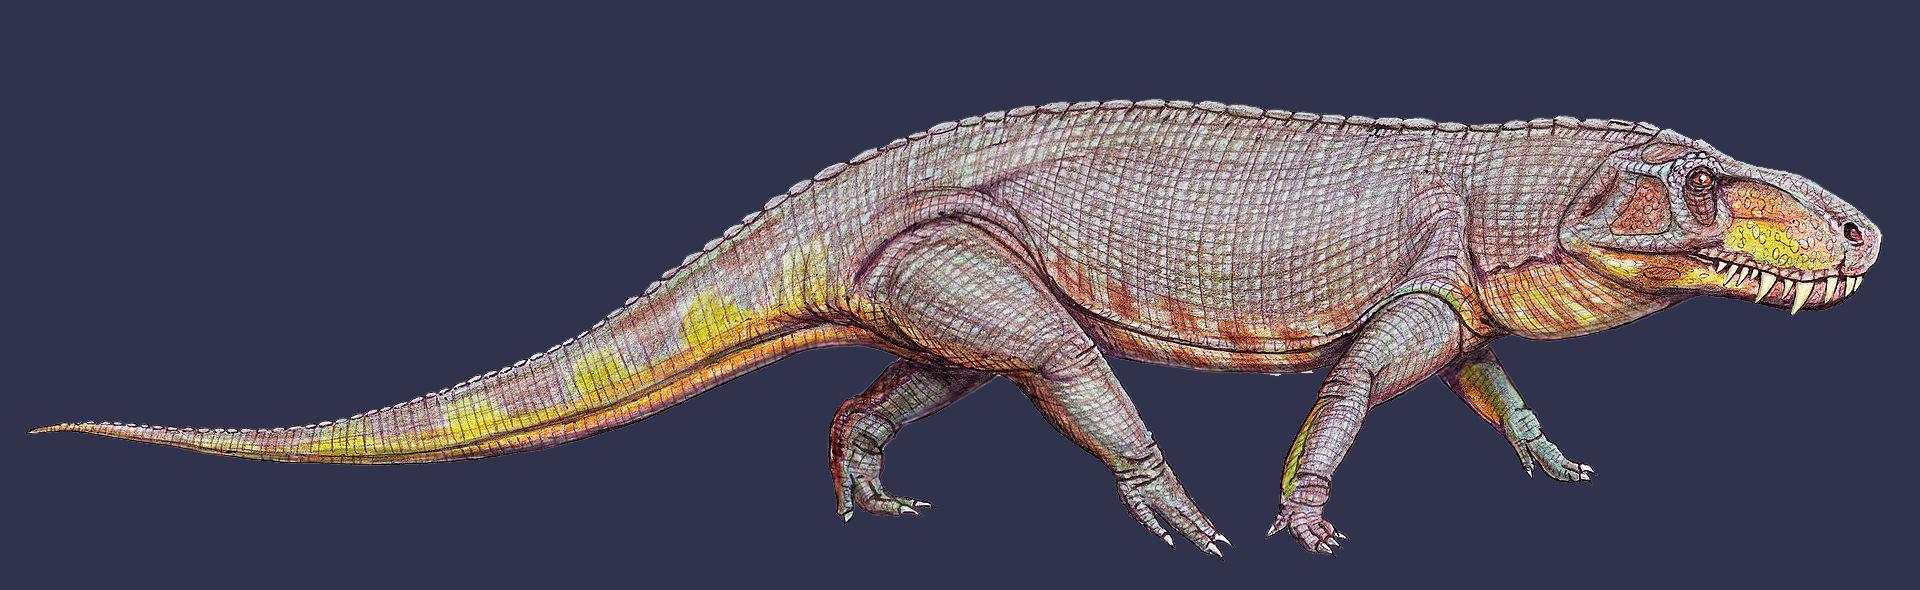 Реконструкция древнего животного Prestosuchus chiniquensis. Фото © Wikipedia